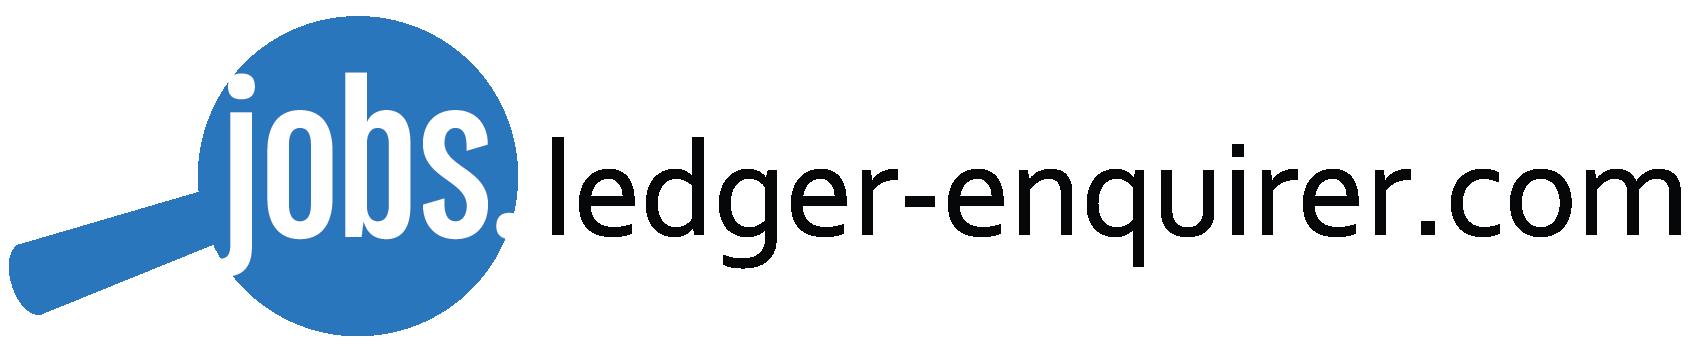 Columbus Ledger Enquirer